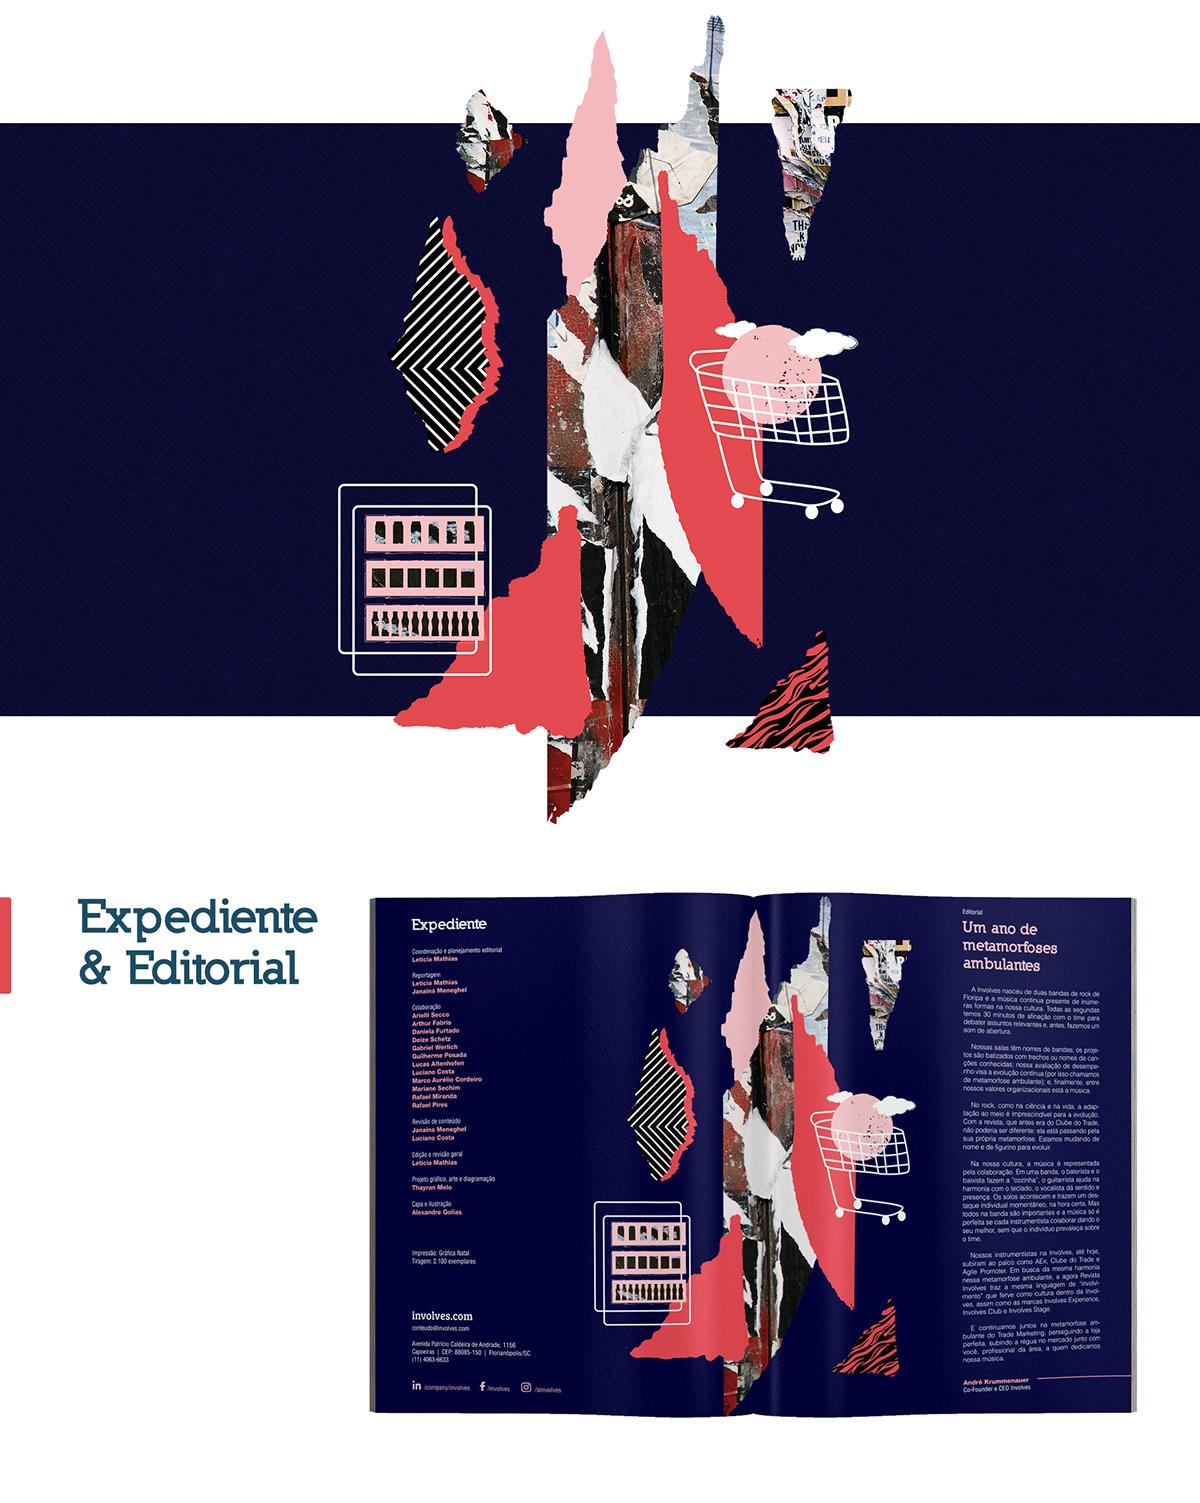 revista involves magazine LGBT Diversity diagramação collage manipulation Recorte ILLUSTRATION